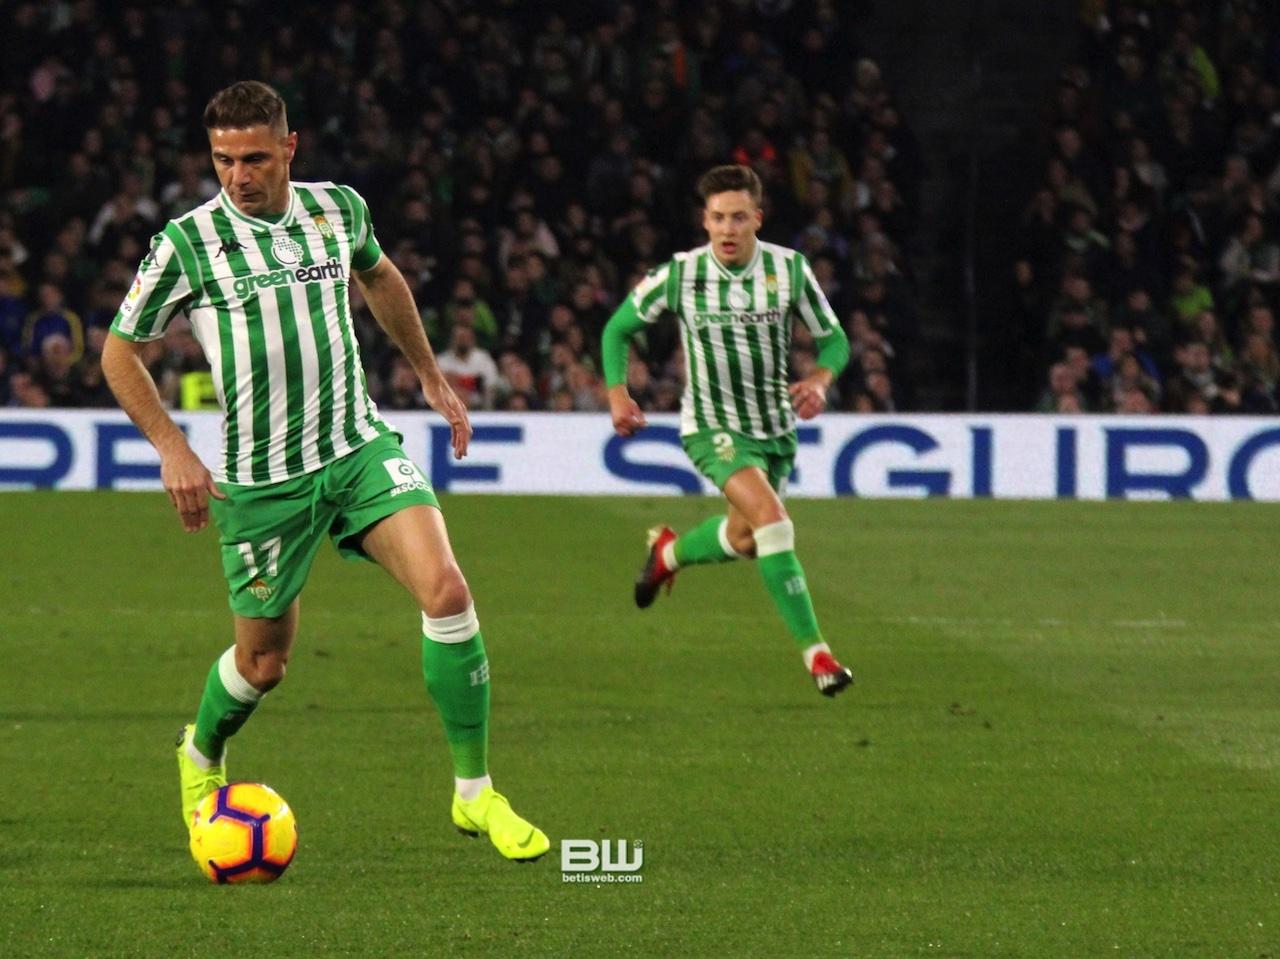 J19 - Betis - Madrid (68)